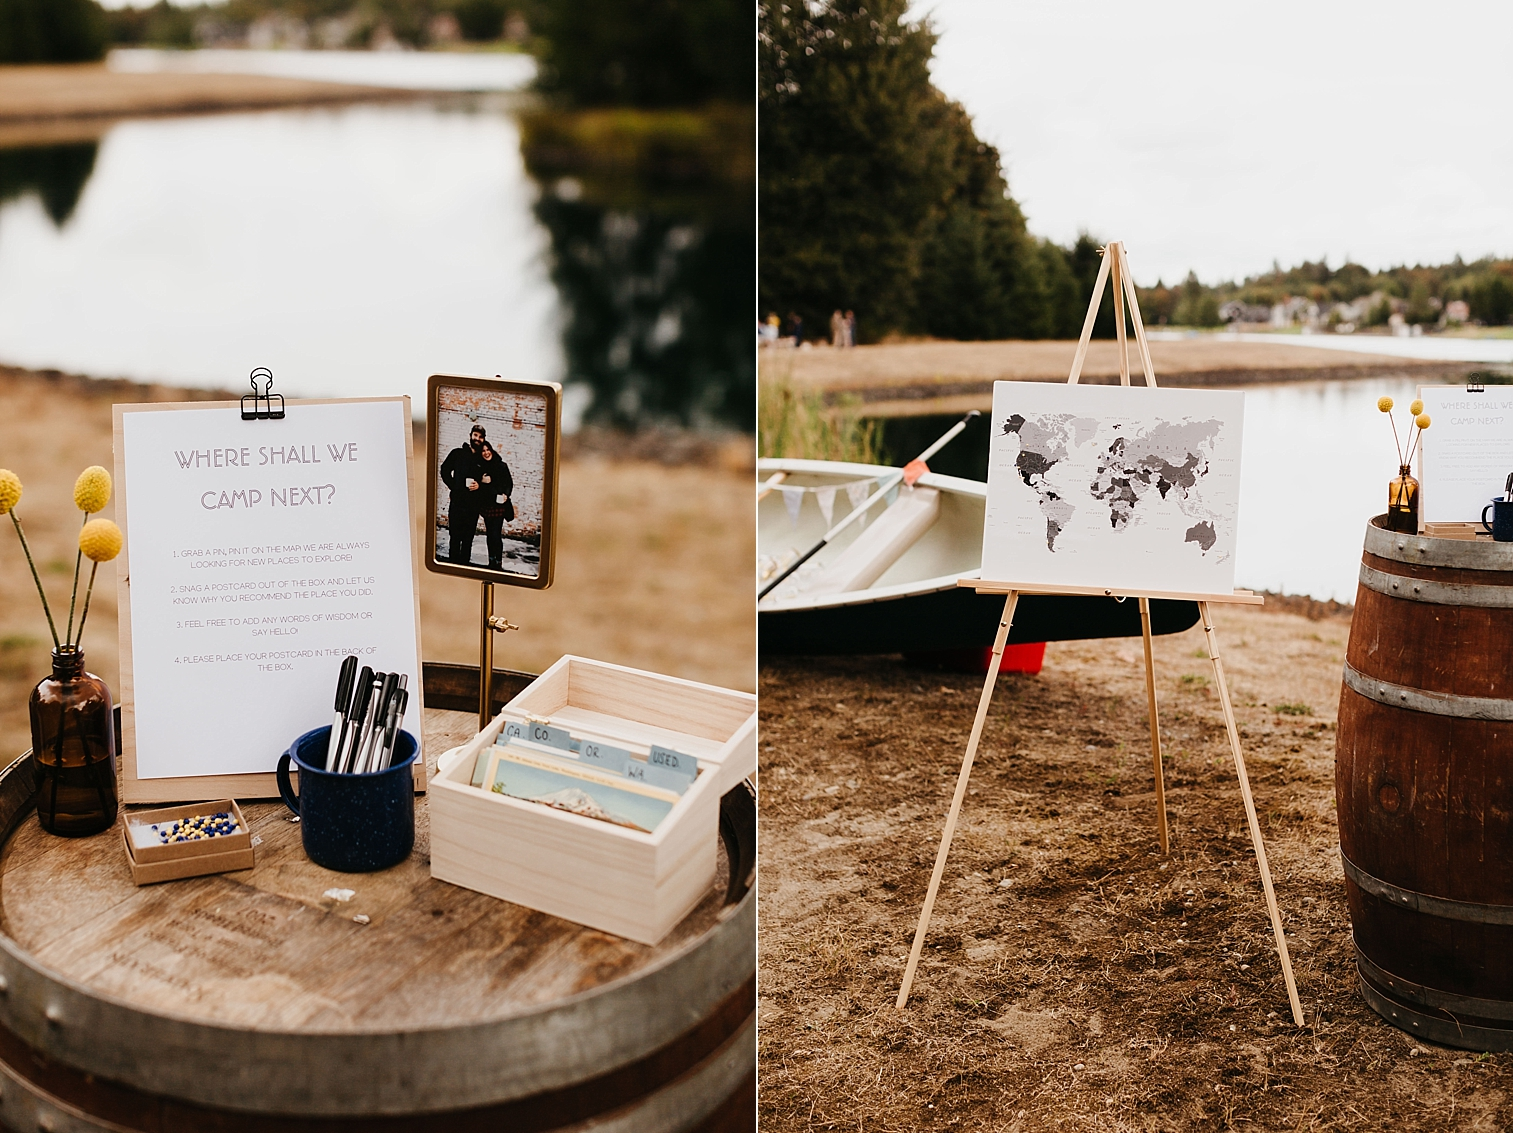 Summer-Camp-Themed-Wedding-74.jpg